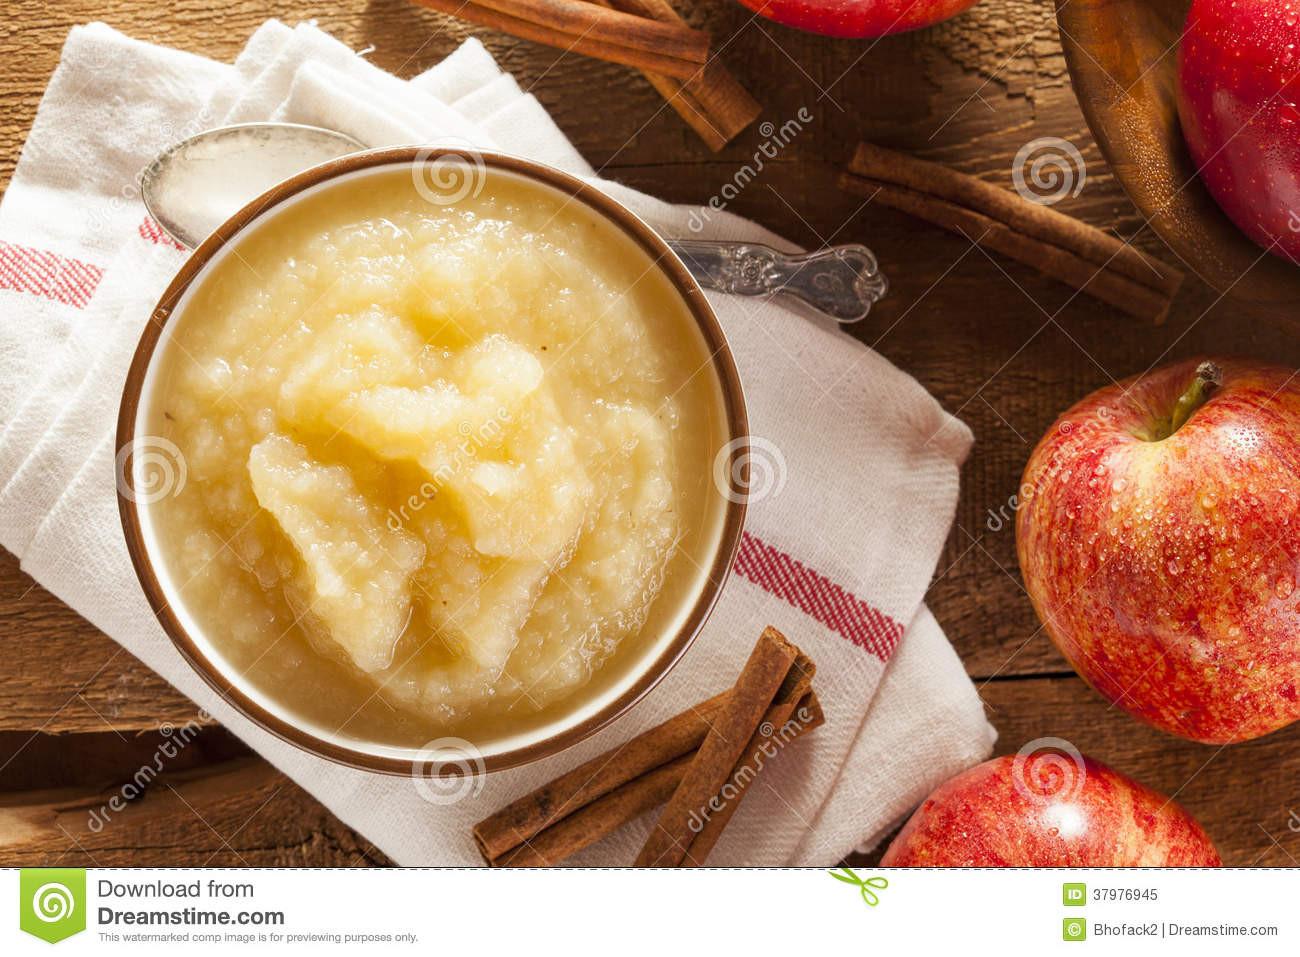 Is Applesauce Healthy  Healthy Organic Applesauce With Cinnamon Stock Image